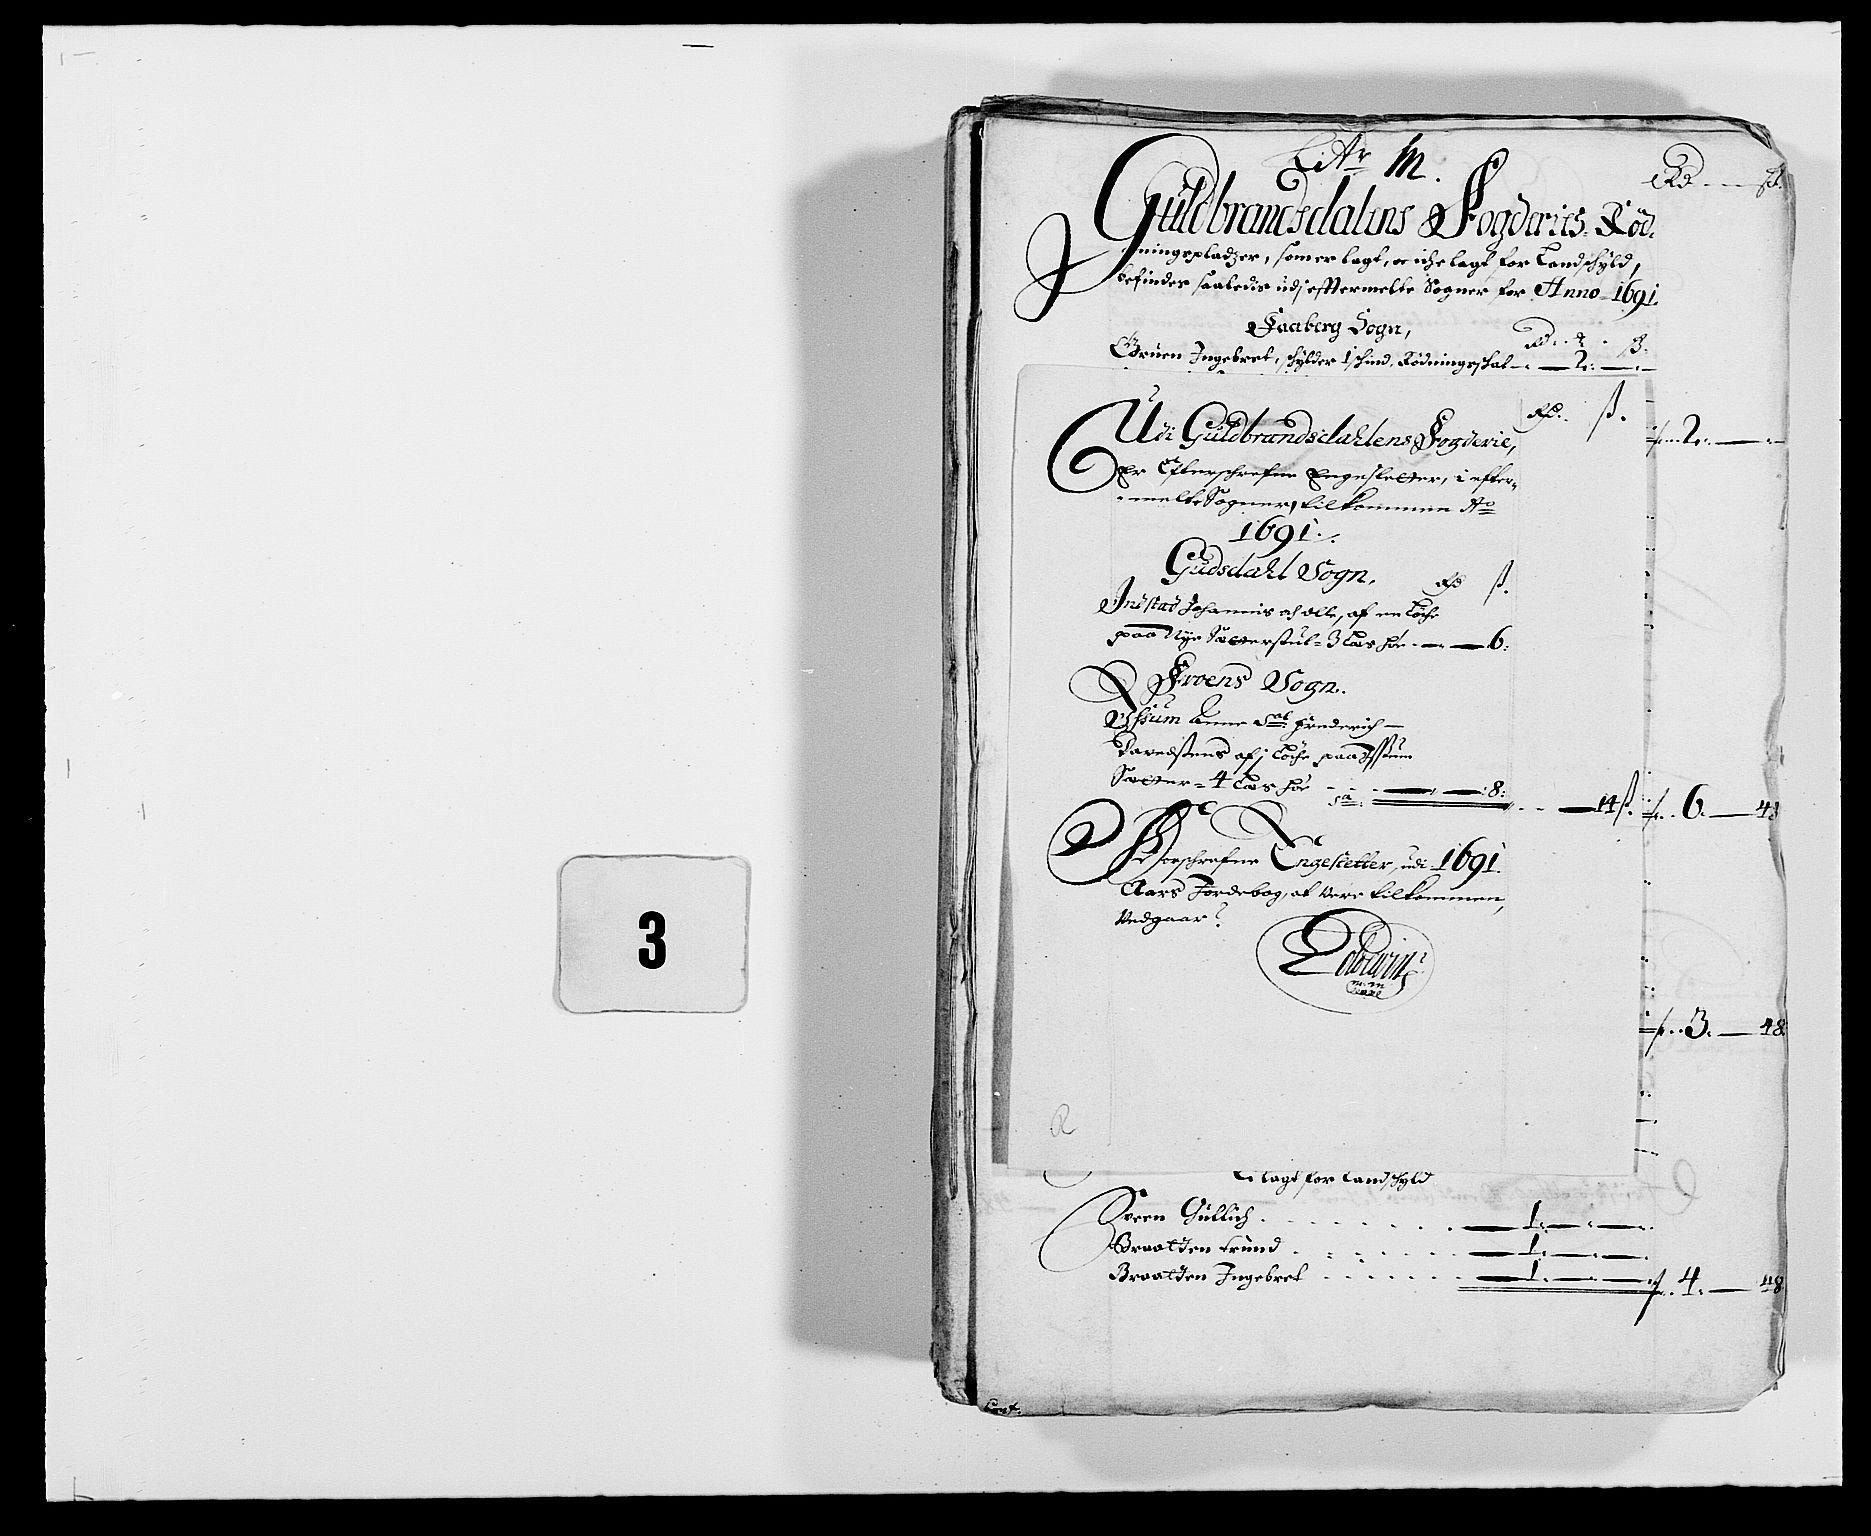 RA, Rentekammeret inntil 1814, Reviderte regnskaper, Fogderegnskap, R17/L1165: Fogderegnskap Gudbrandsdal, 1690-1692, s. 205